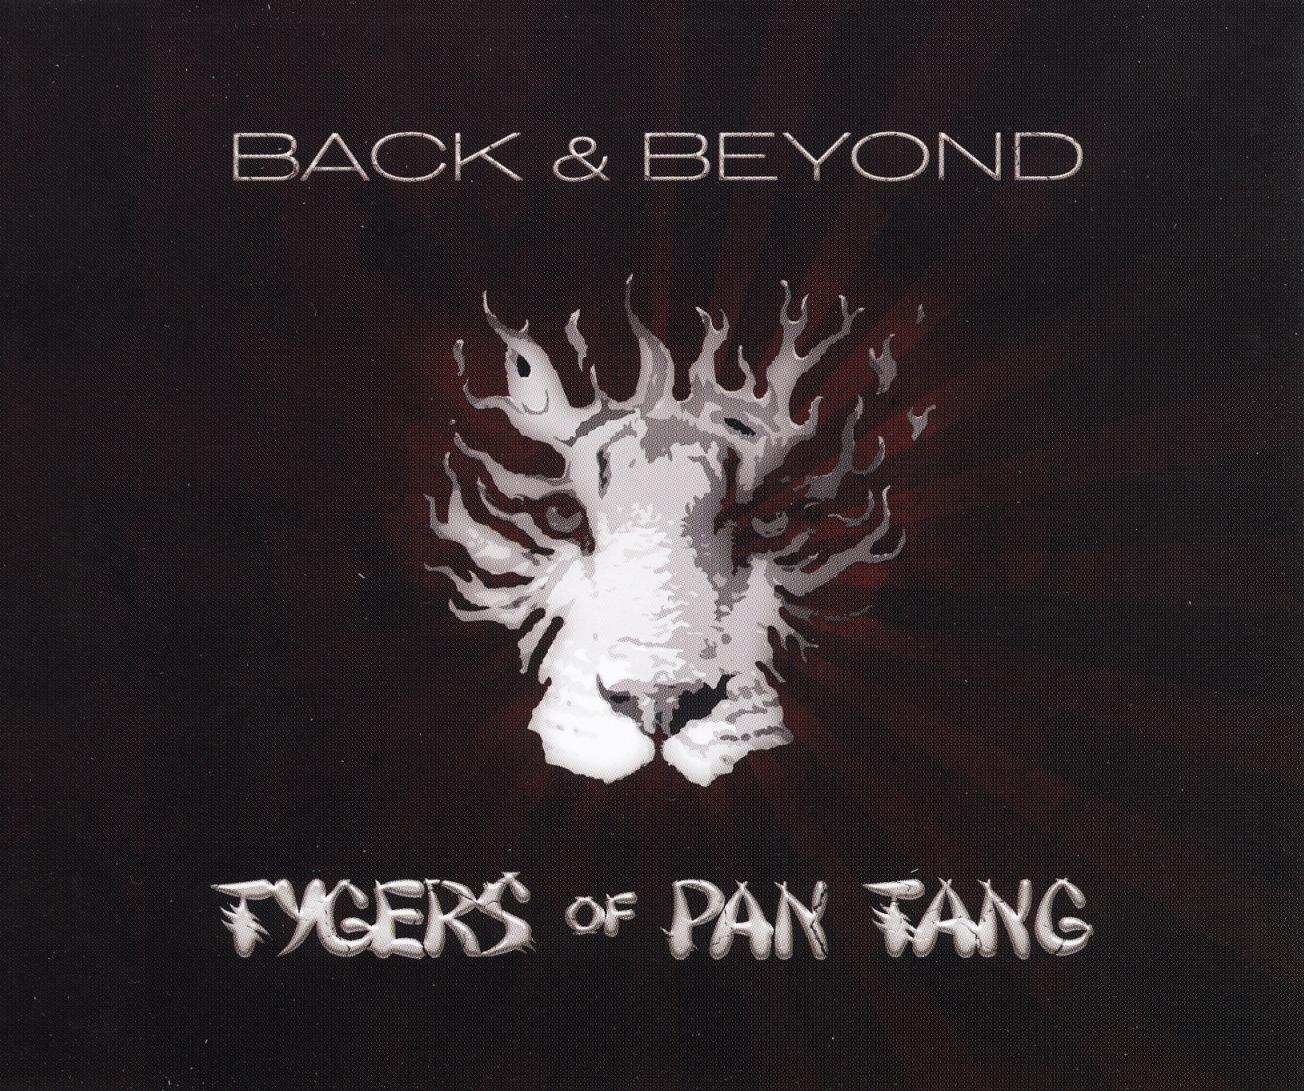 TYGERS OF PAN TANG (UK) / Back & Beyond